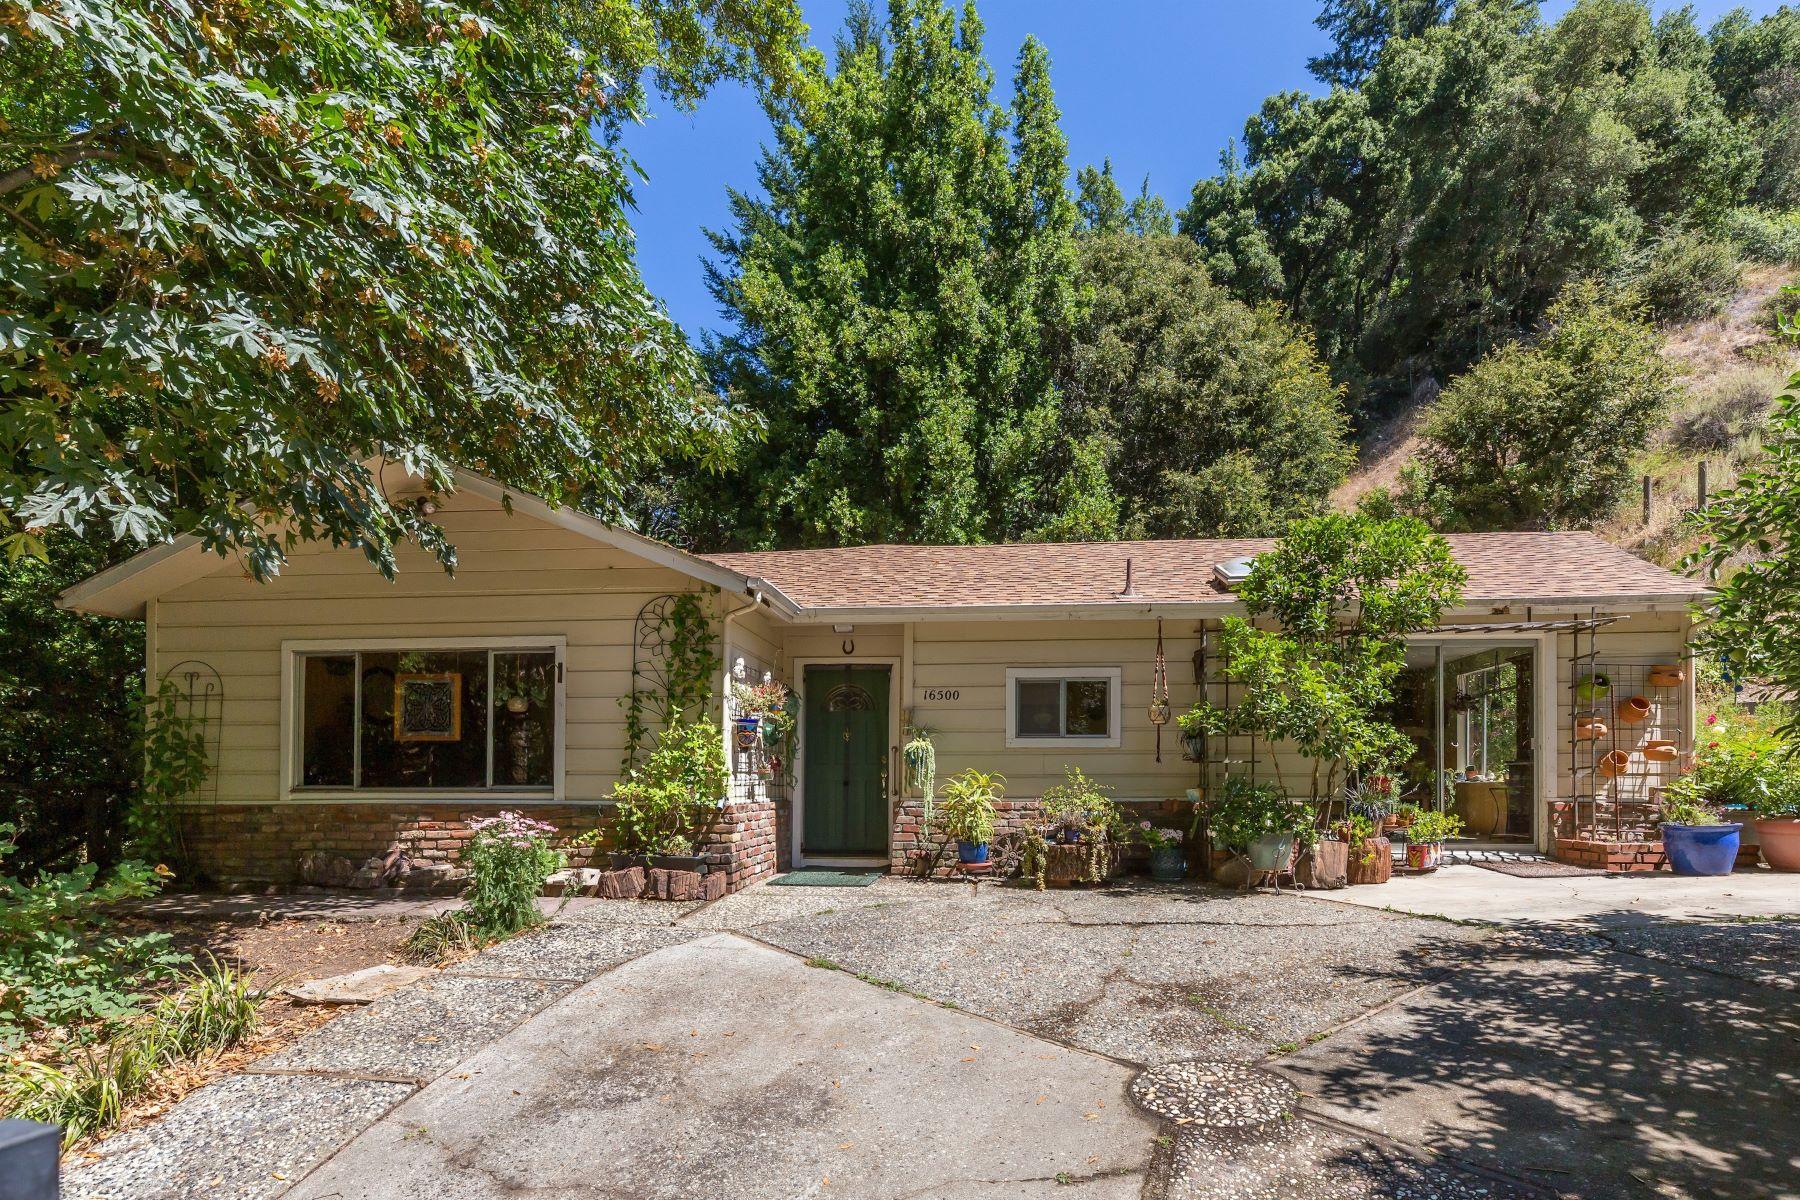 Single Family Homes for Sale at Best Value in Saratoga School District! 16500 Sanborn Road Saratoga, California 95070 United States